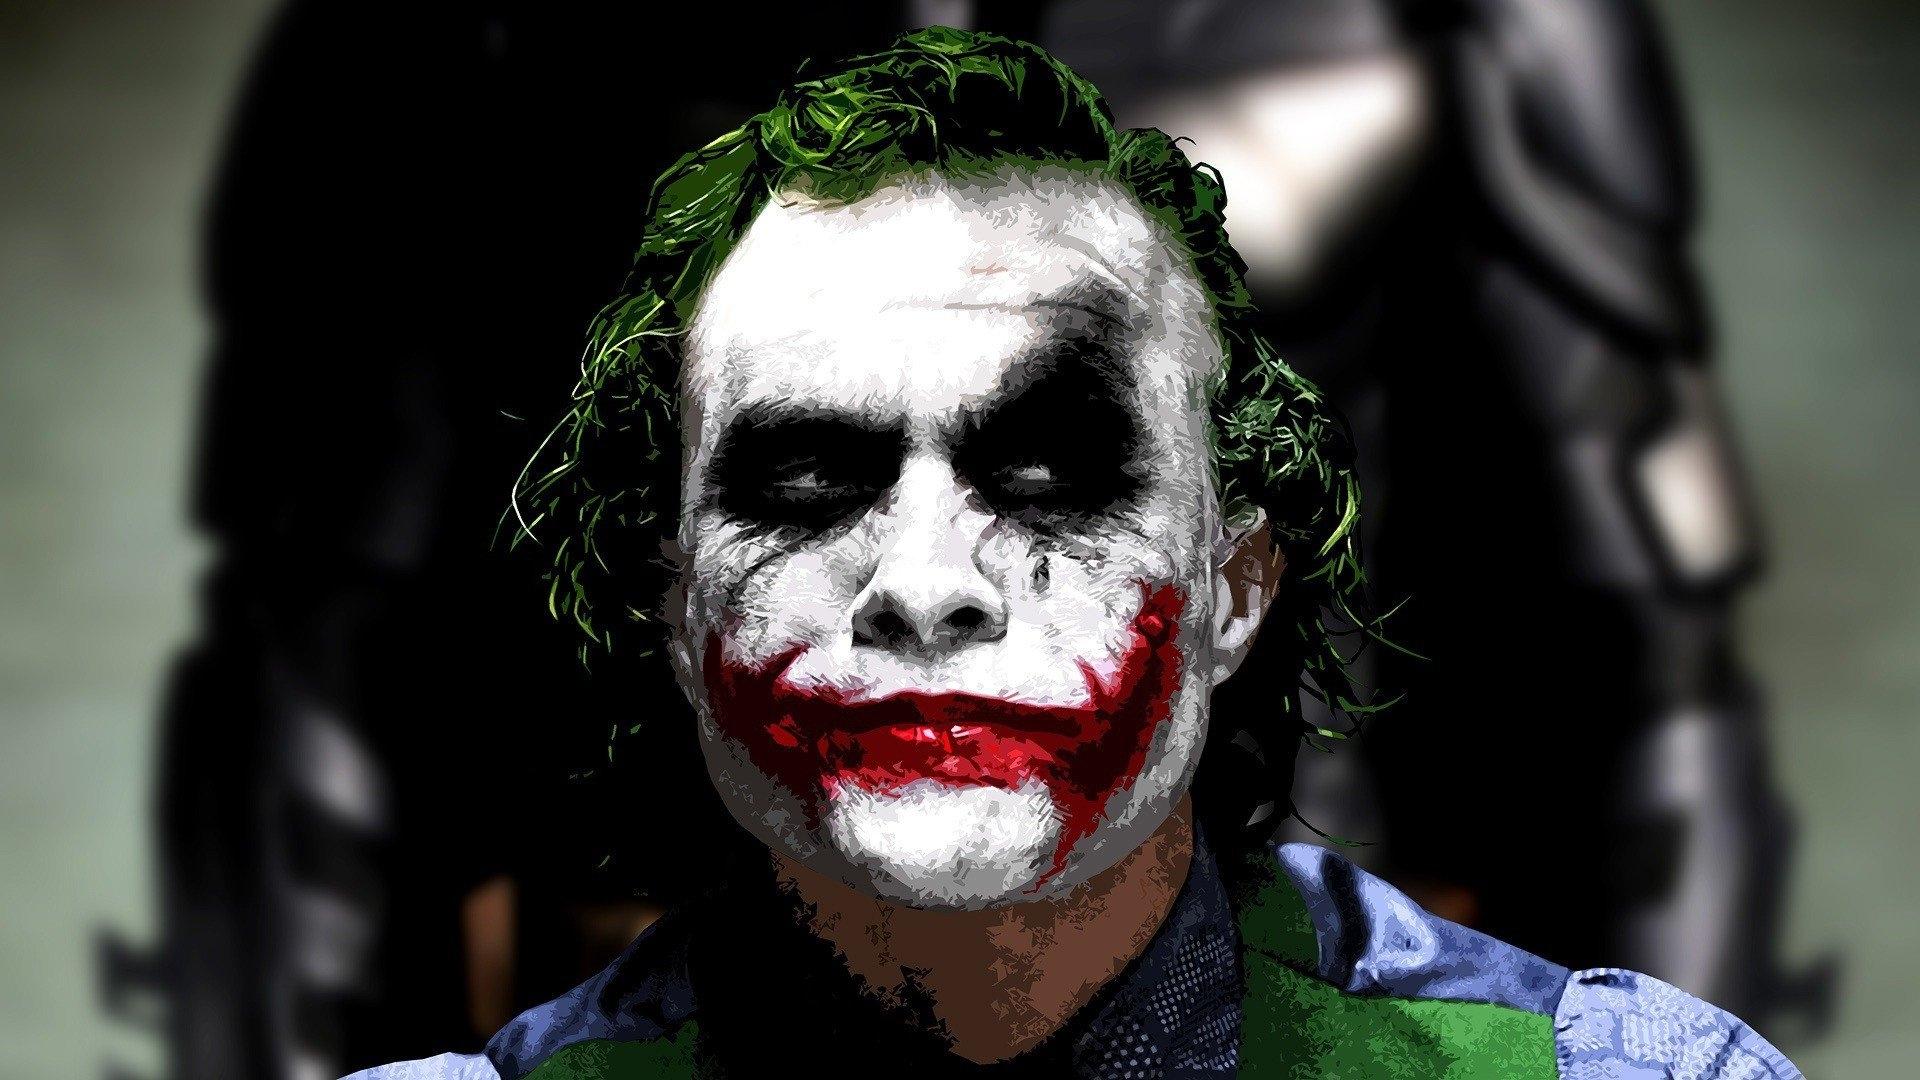 batman joker the dark knight heath ledger movies - walldevil